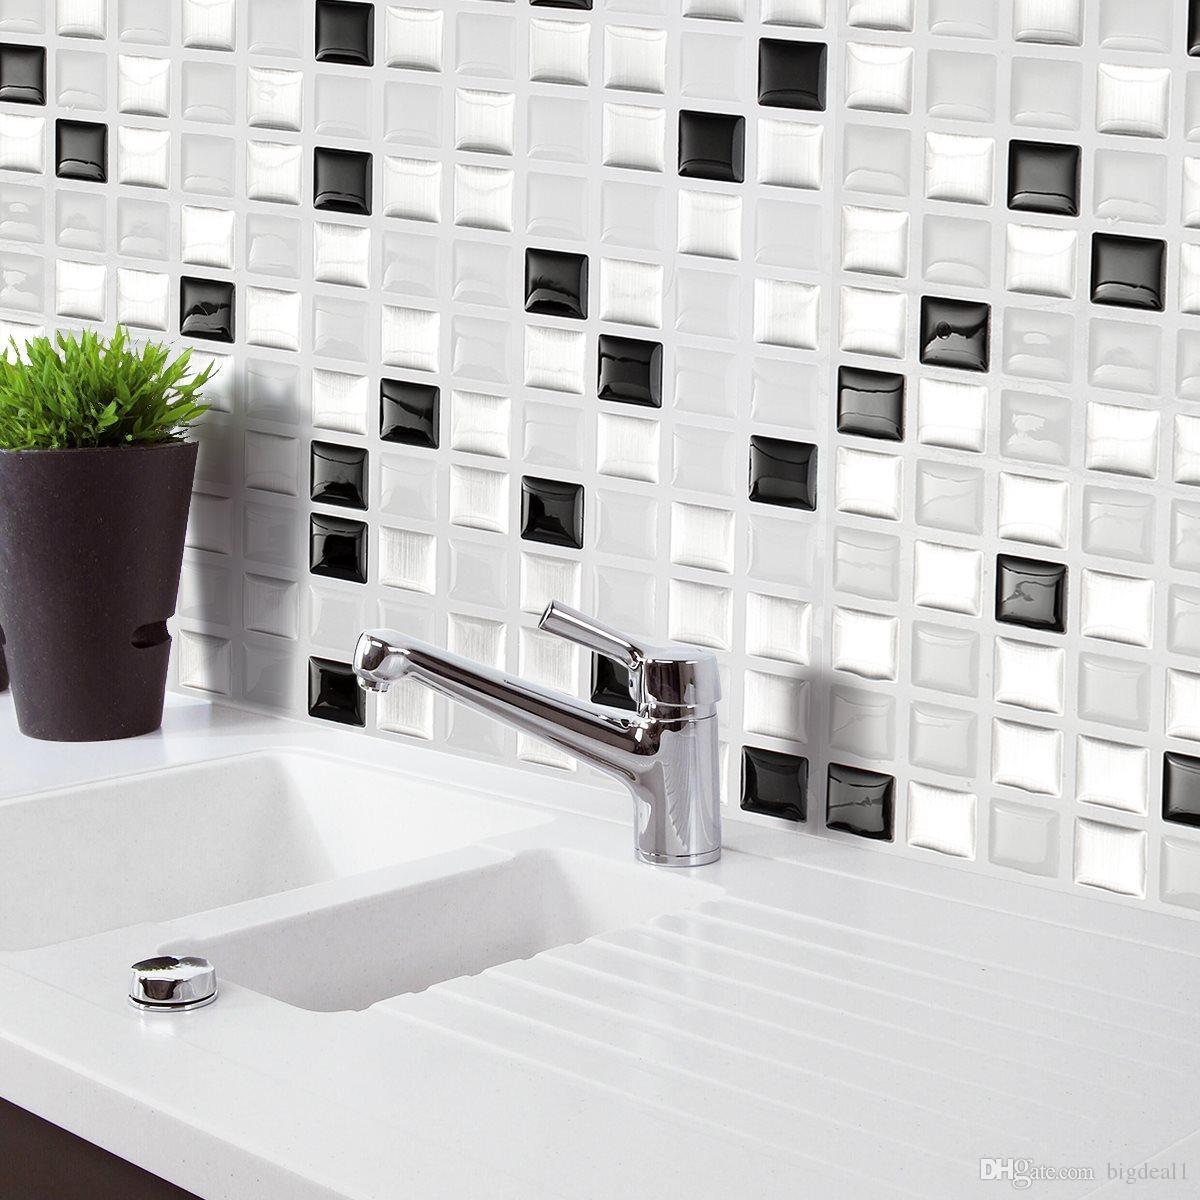 Großhandel Ziegel M Osaic Küche Badezimmer Folie Schönheit 3D ...